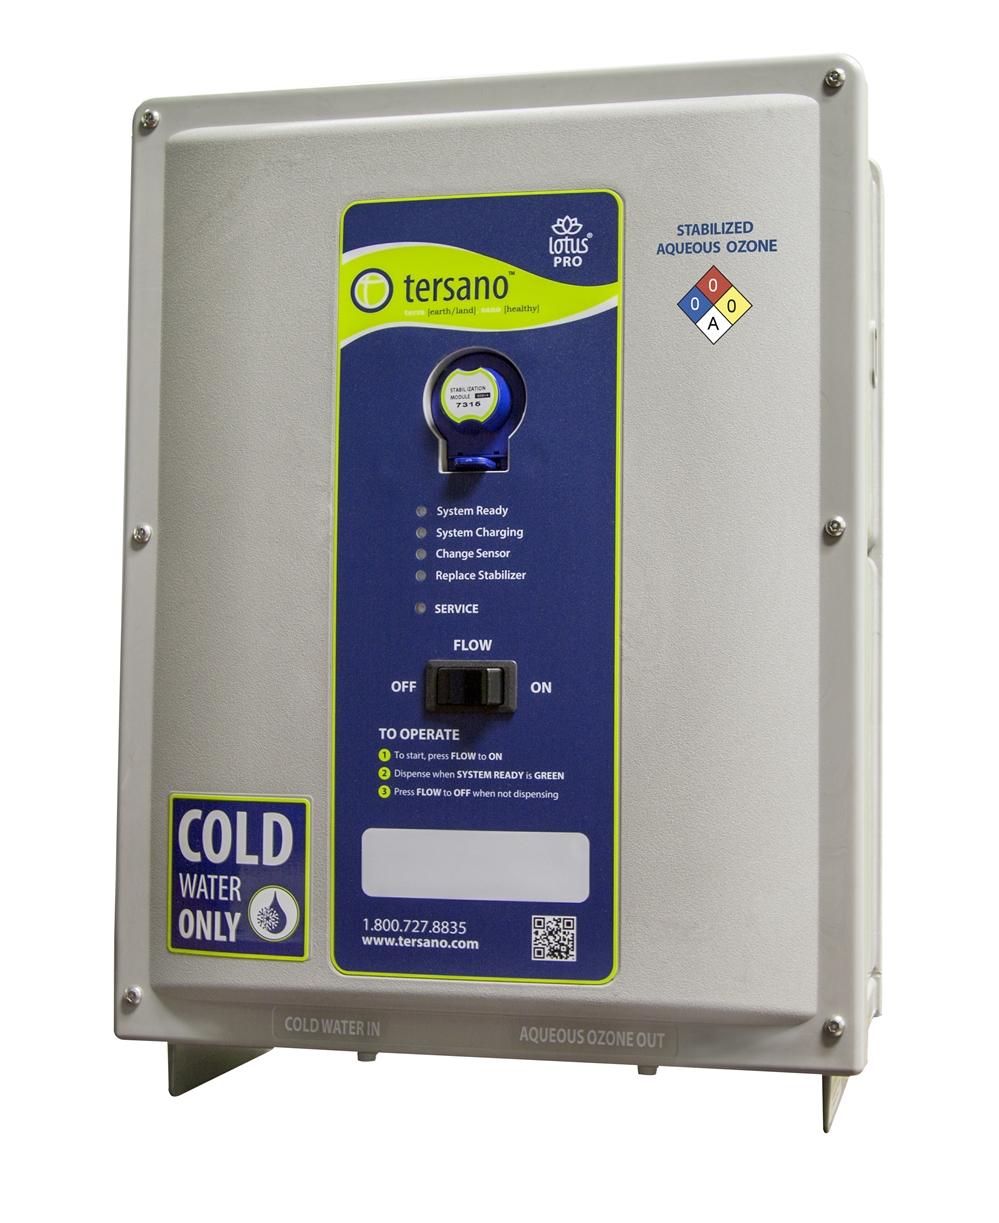 Lotus PRO Aqueous Ozone Generator | Alpha Tech Pet